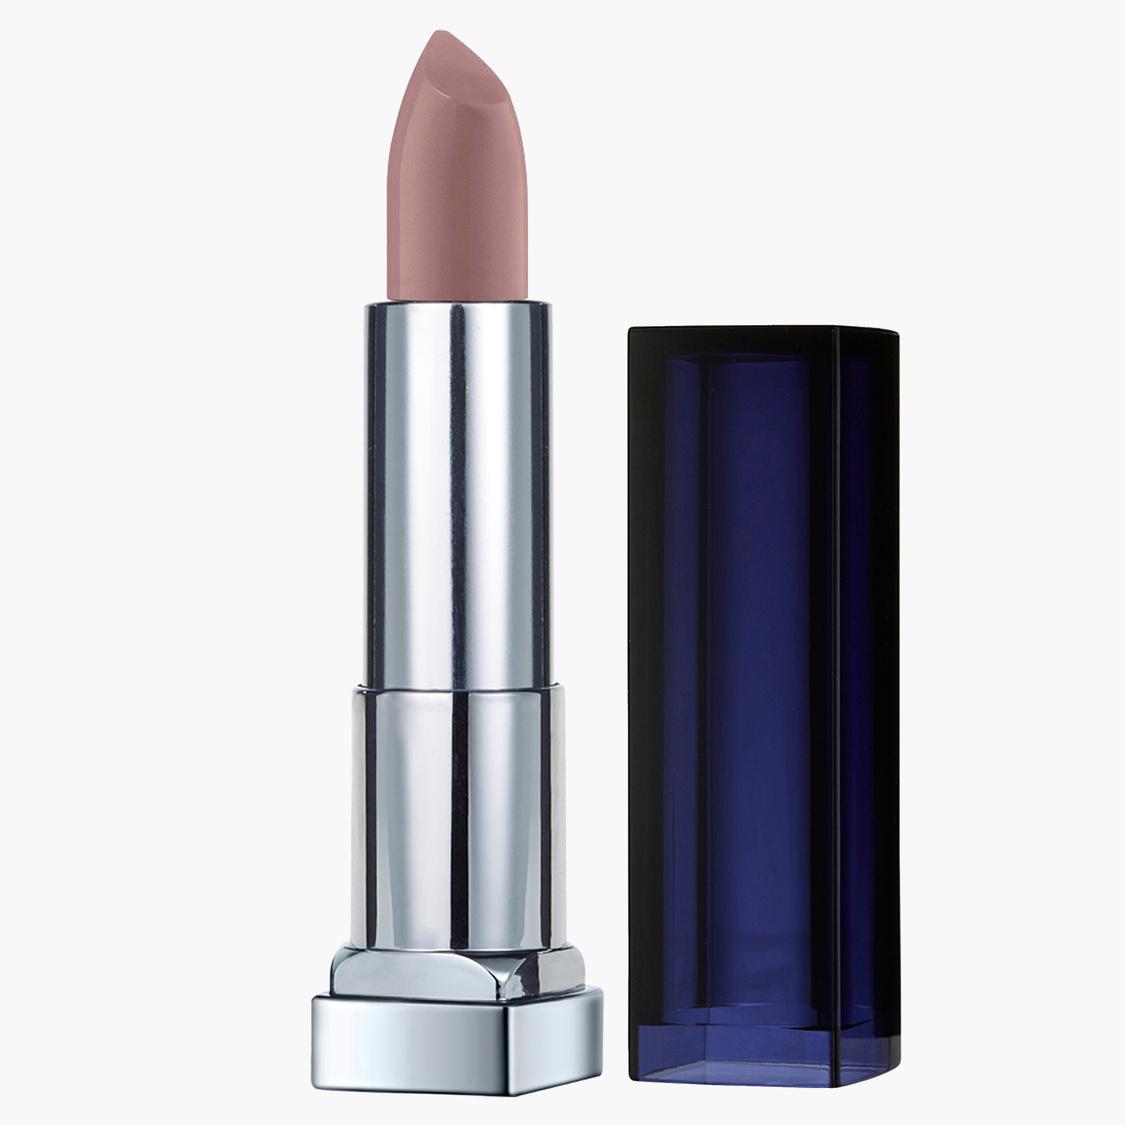 Maybelline New York Colour Sensational Loaded Bolds Lipstick